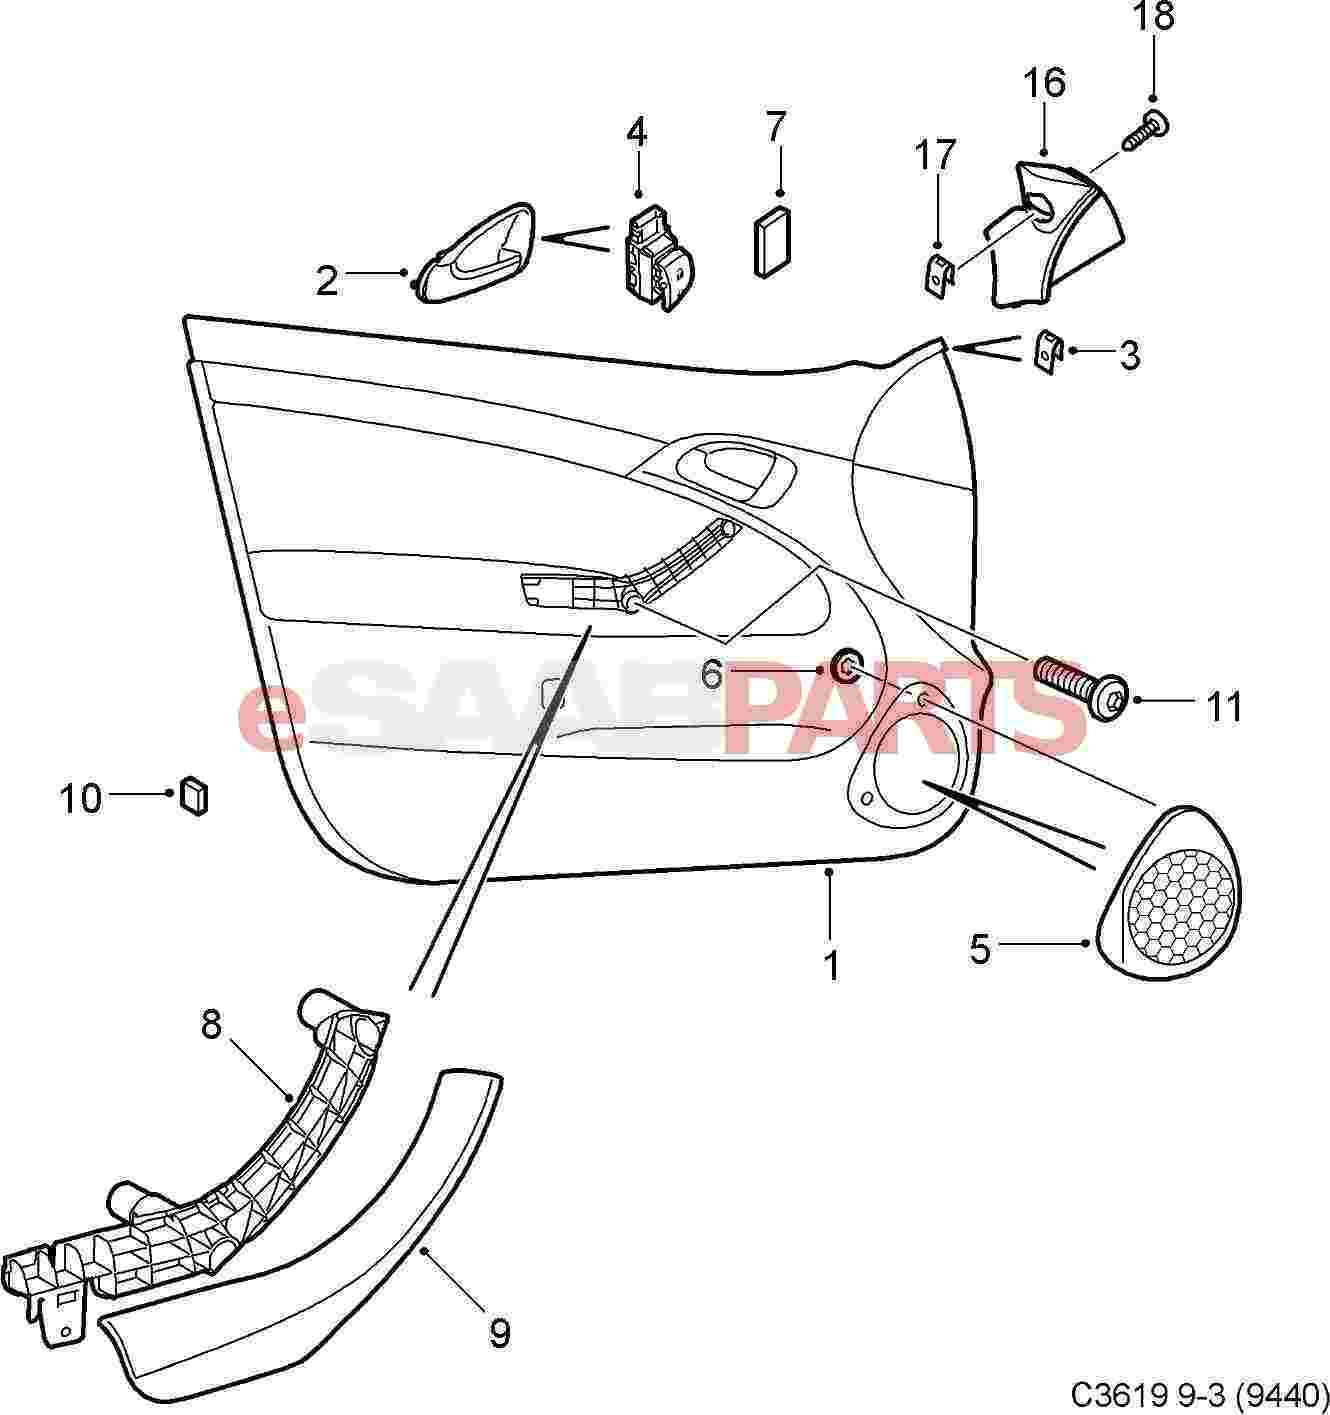 door handle parts diagram usb 2 0 wiring 12803219 saab inner front lh genuine